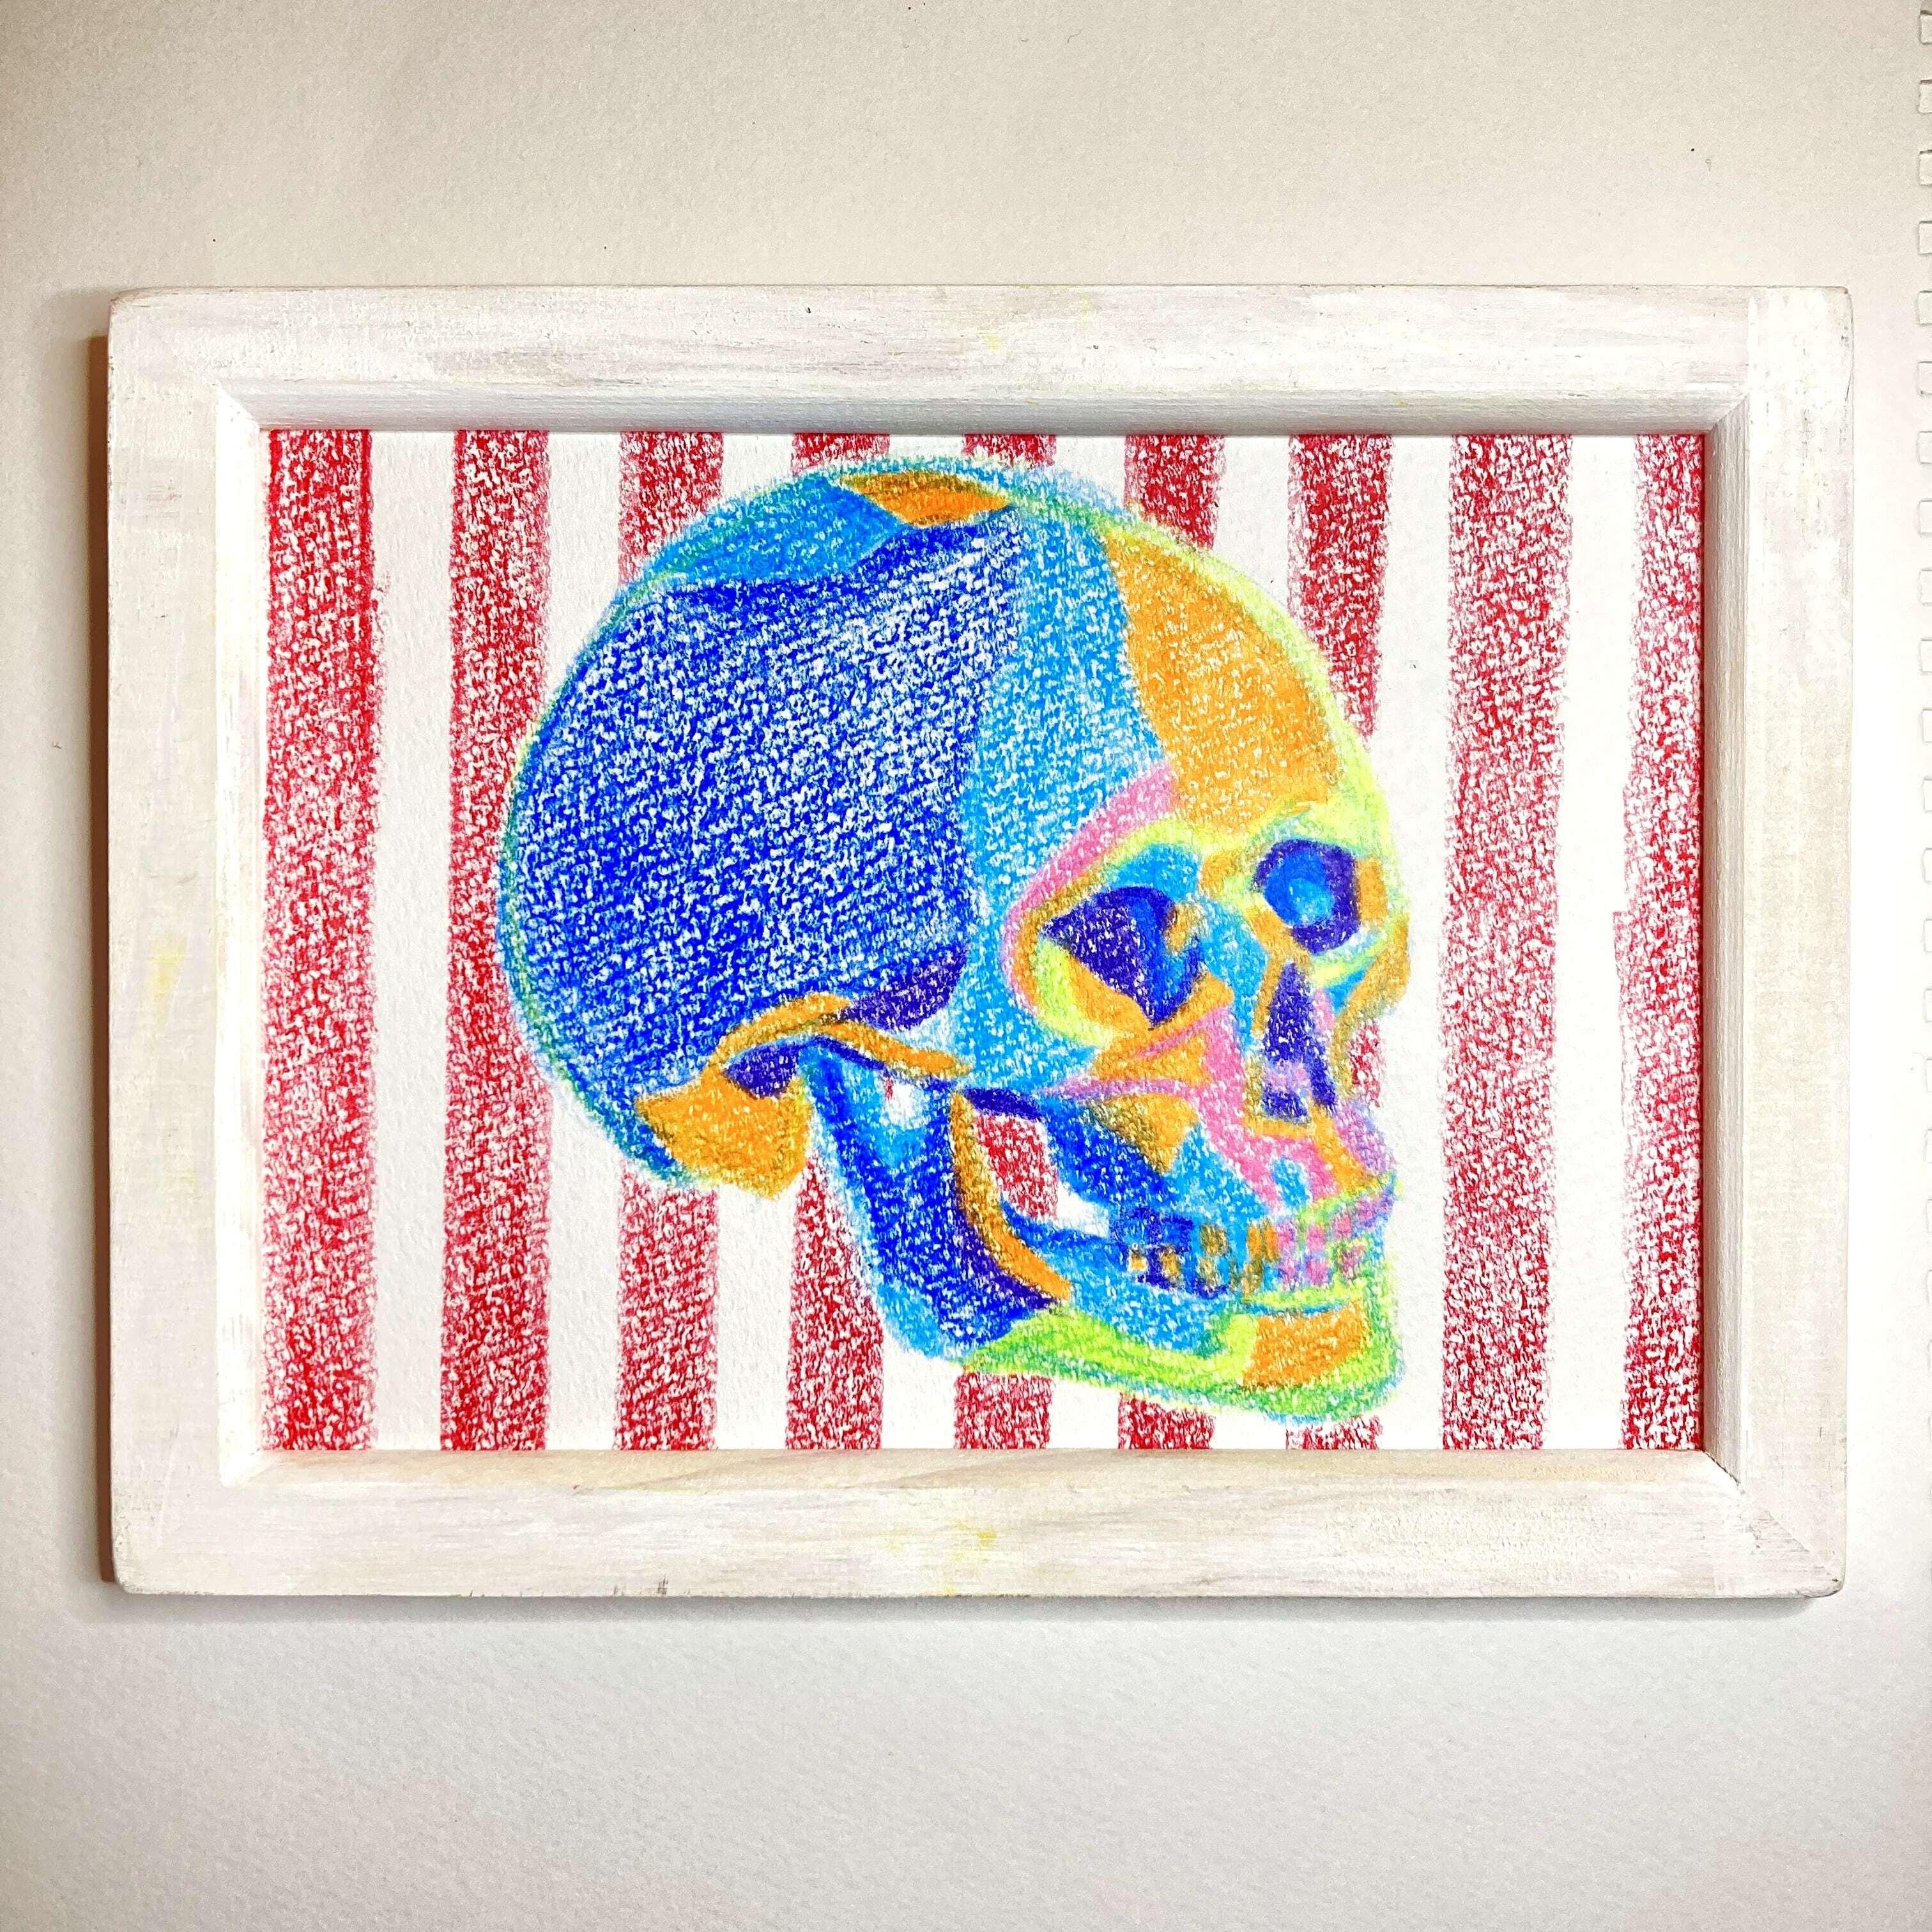 VARIOUS DRAWING / 202mm×150mm / Crayon / Original Drawing